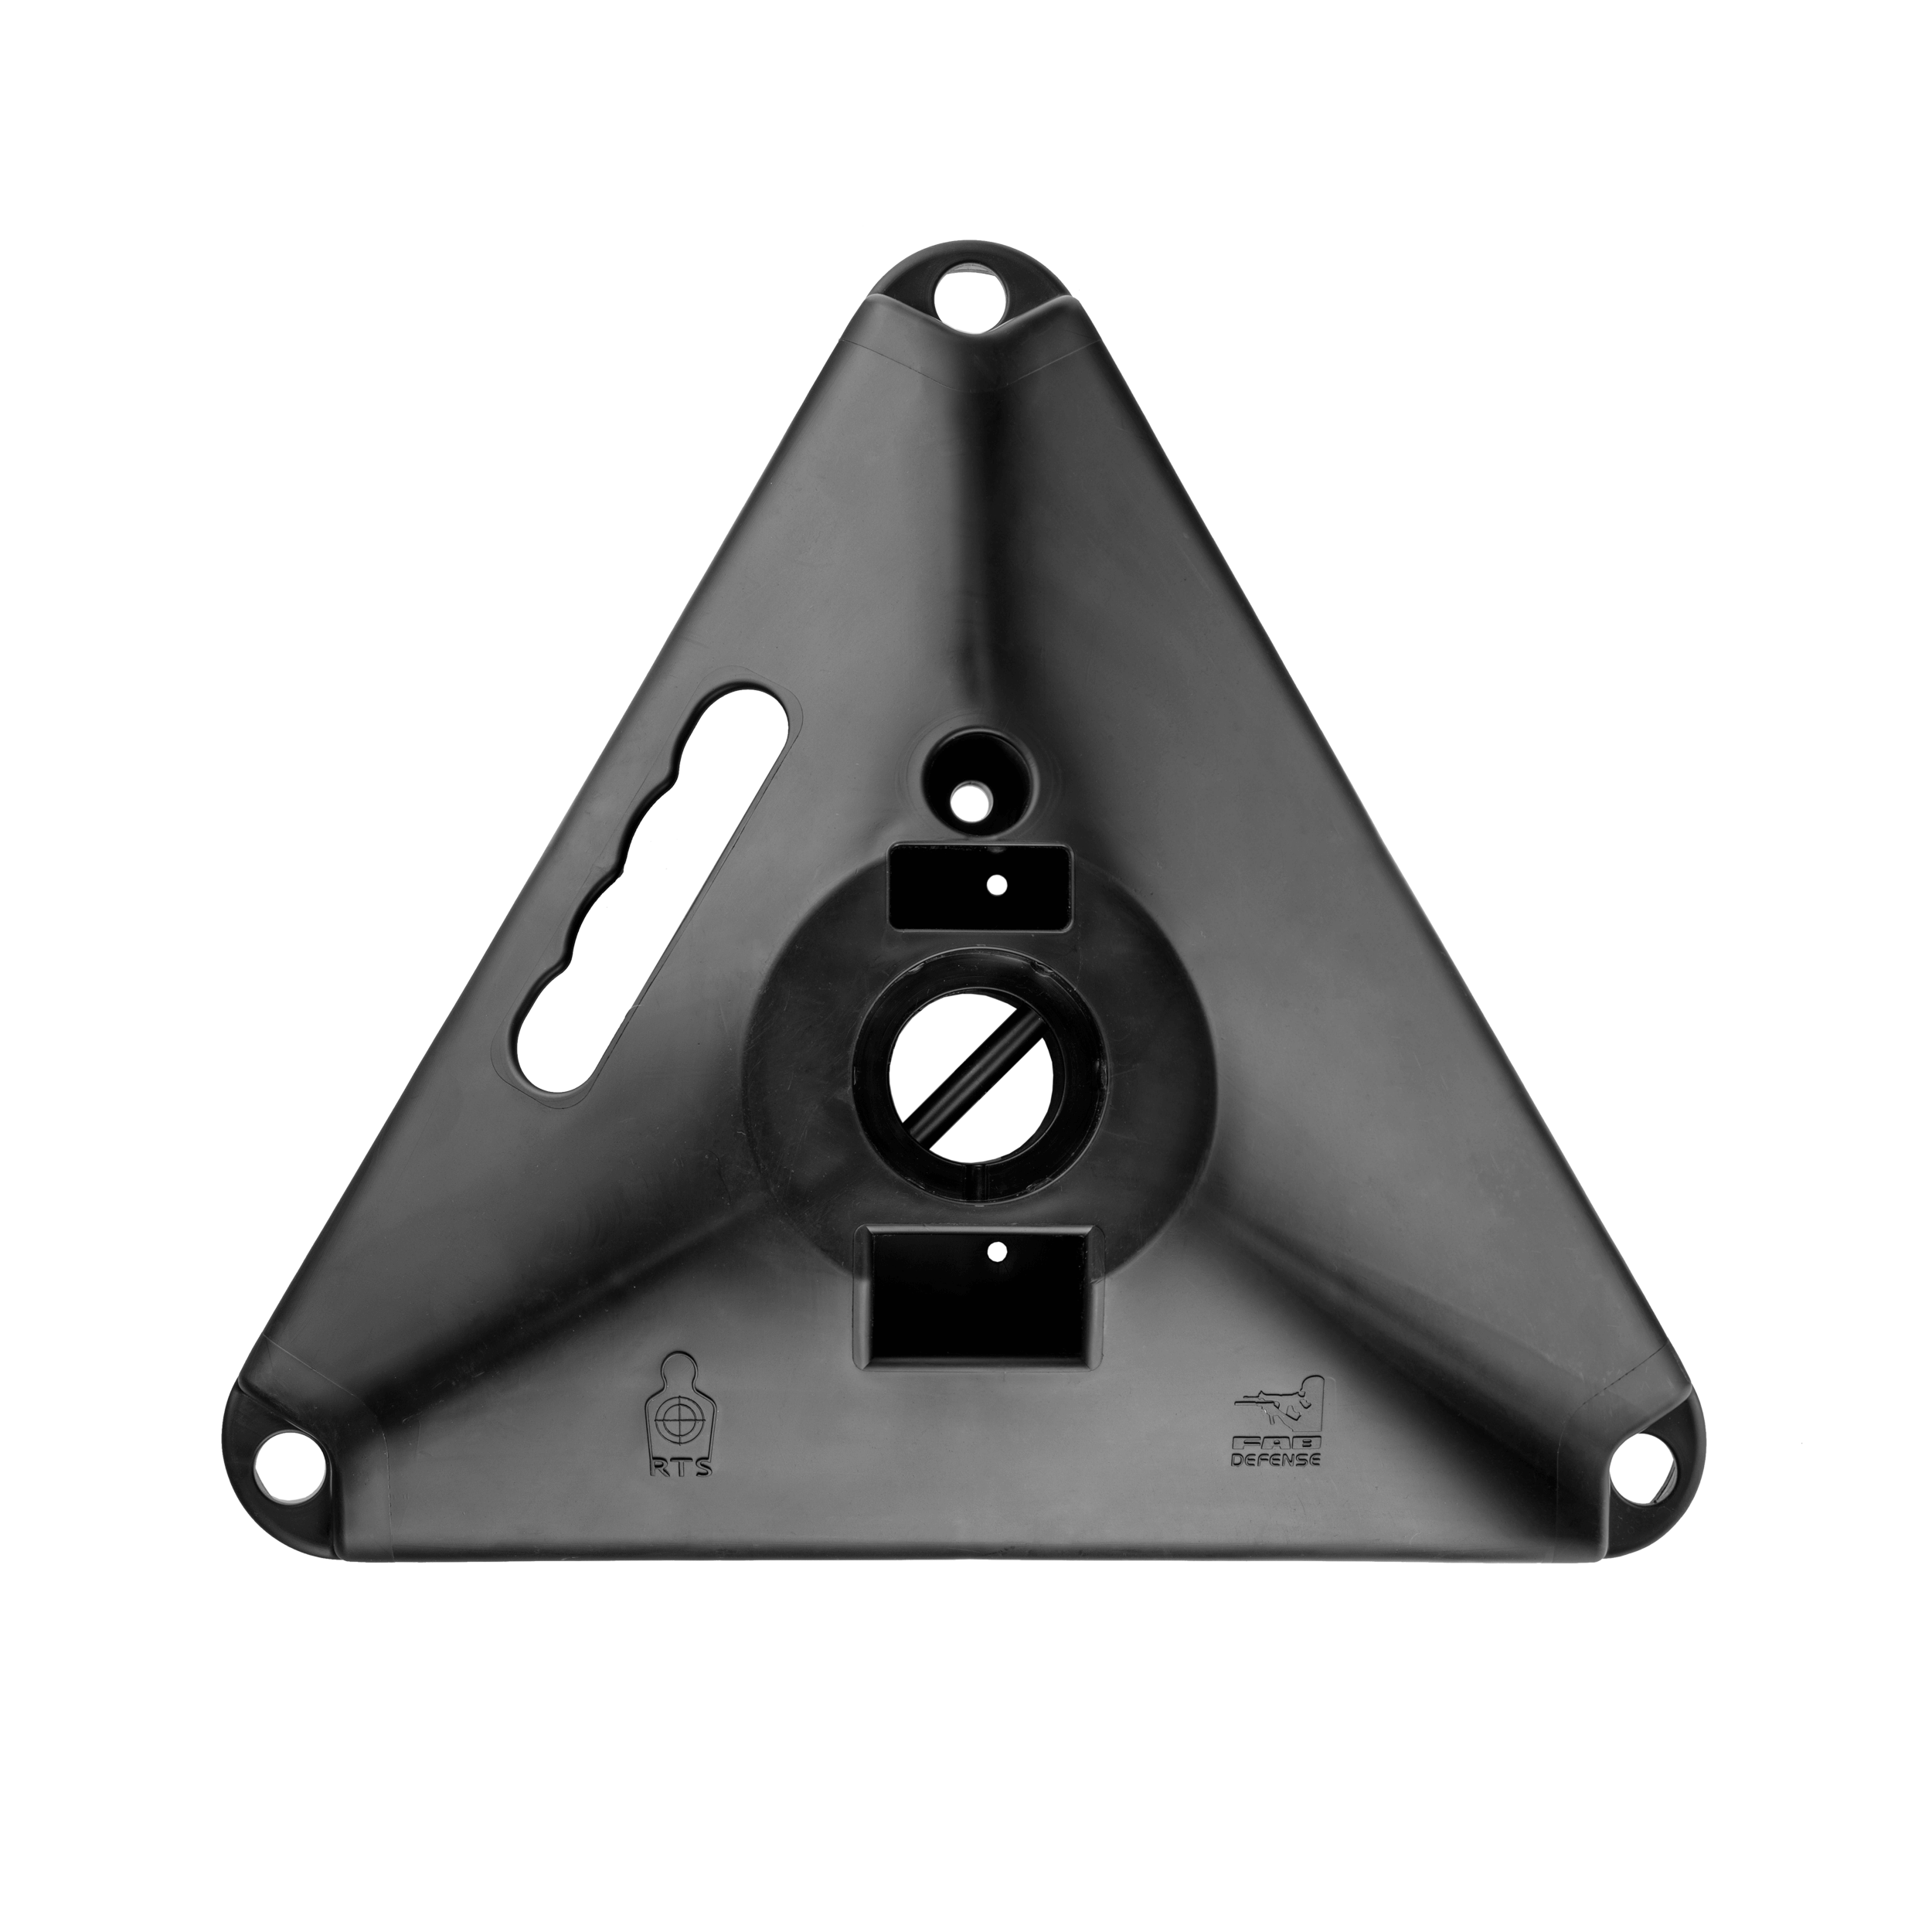 Target Base (no plate)